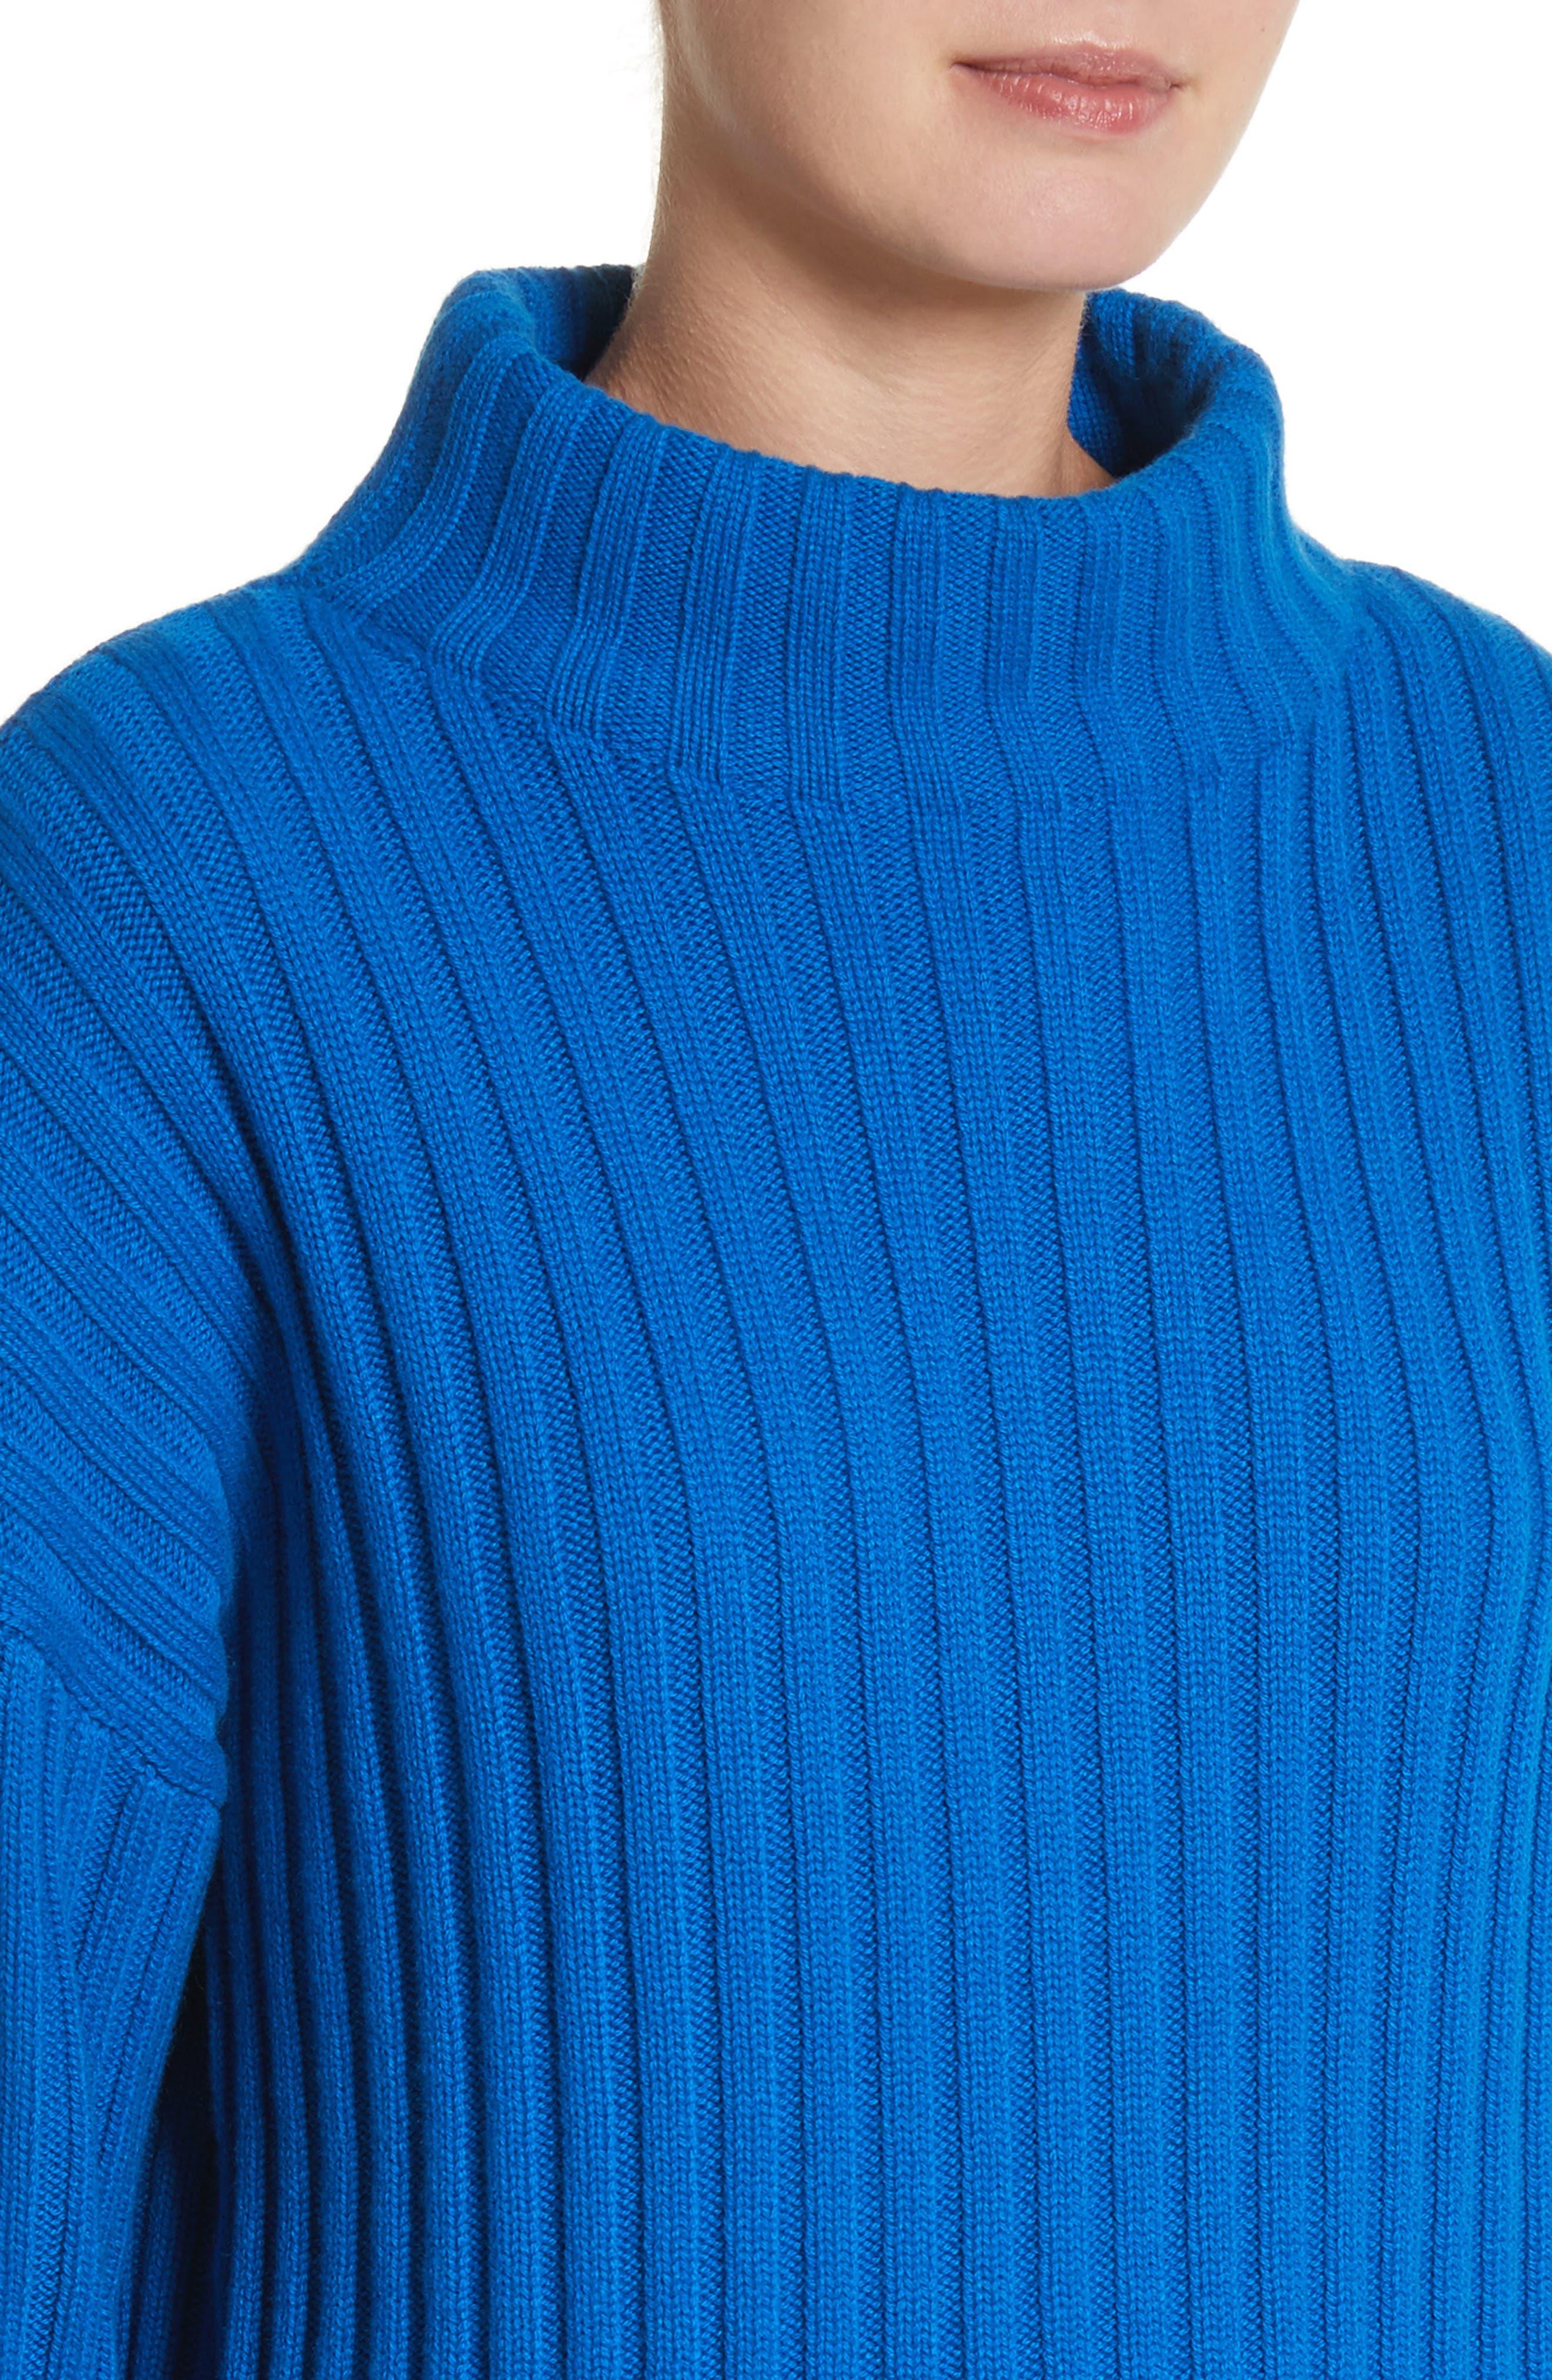 Cashmere Funnel Neck Pullover,                             Alternate thumbnail 4, color,                             Mediterranean